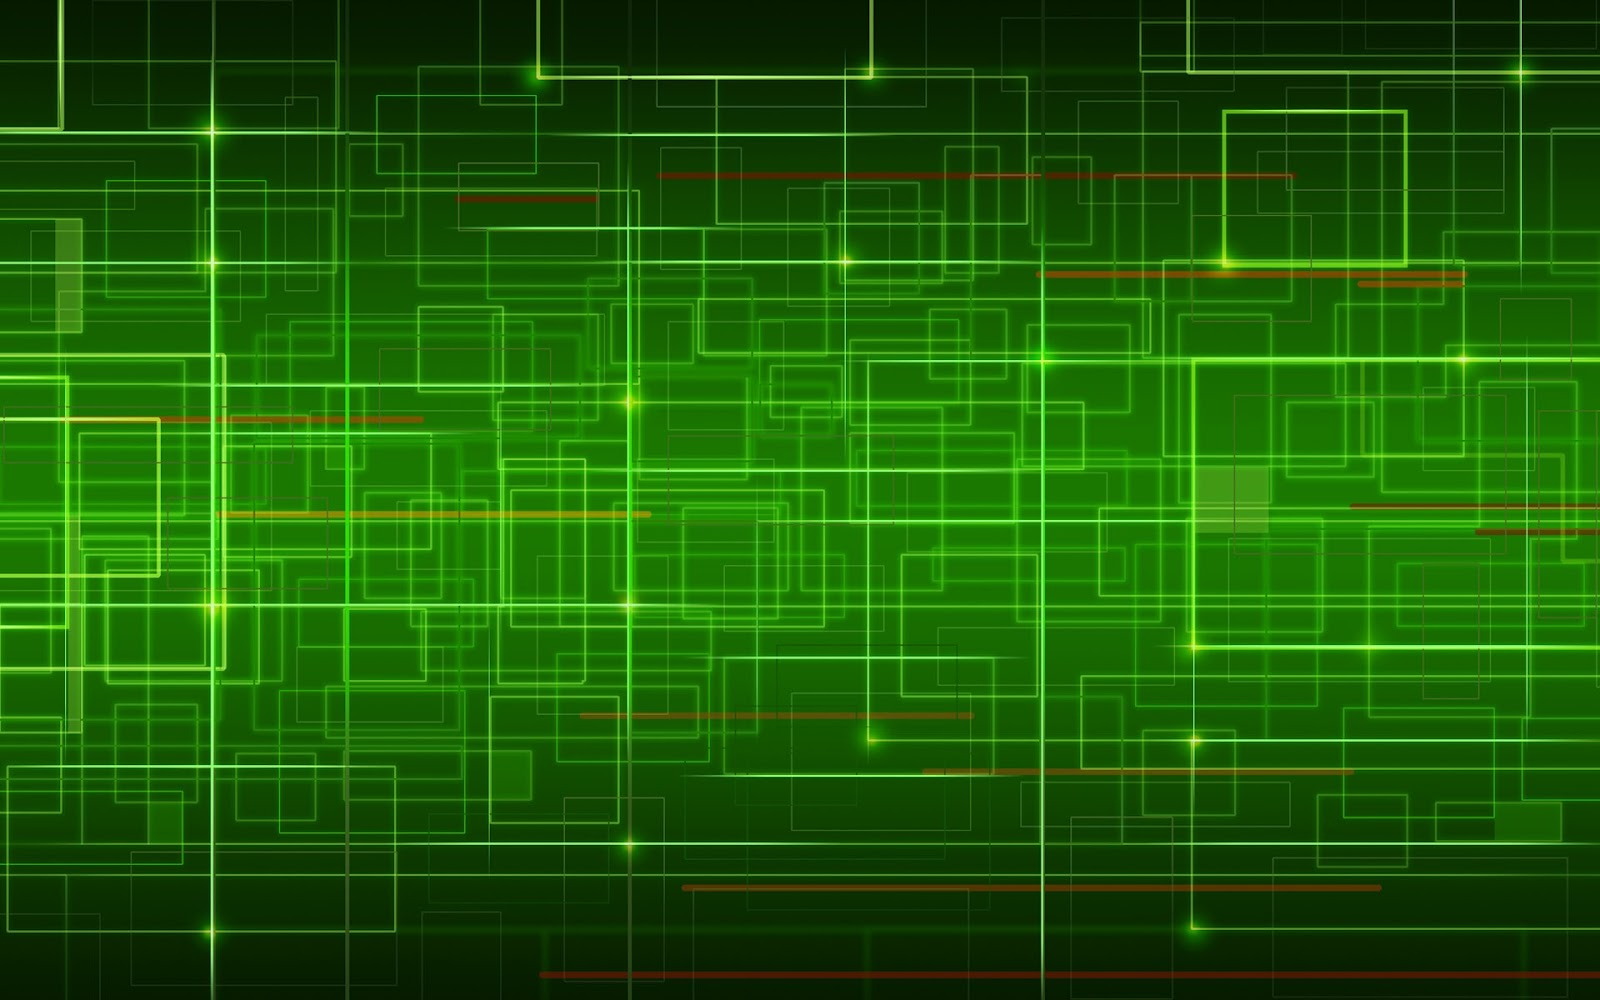 http://3.bp.blogspot.com/-suohCSCV_qU/UNBUawa2G9I/AAAAAAAABbs/k64RfeDo8L0/s1600/Green-wallpapers+hd.jpg